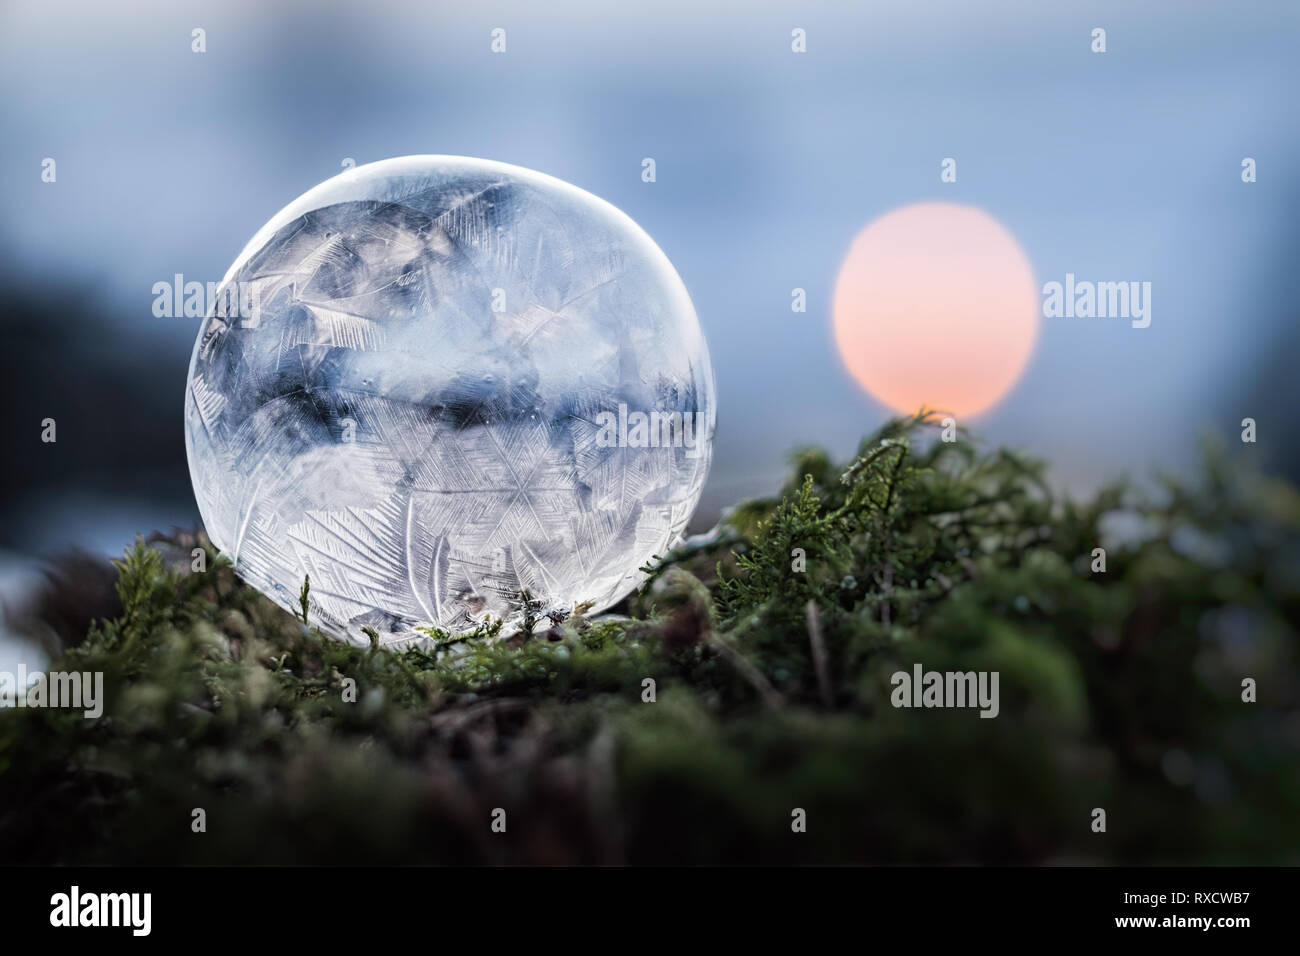 Gefrorene Seifenblase bei minus 10° Celsius bei Windstille - Stock Image